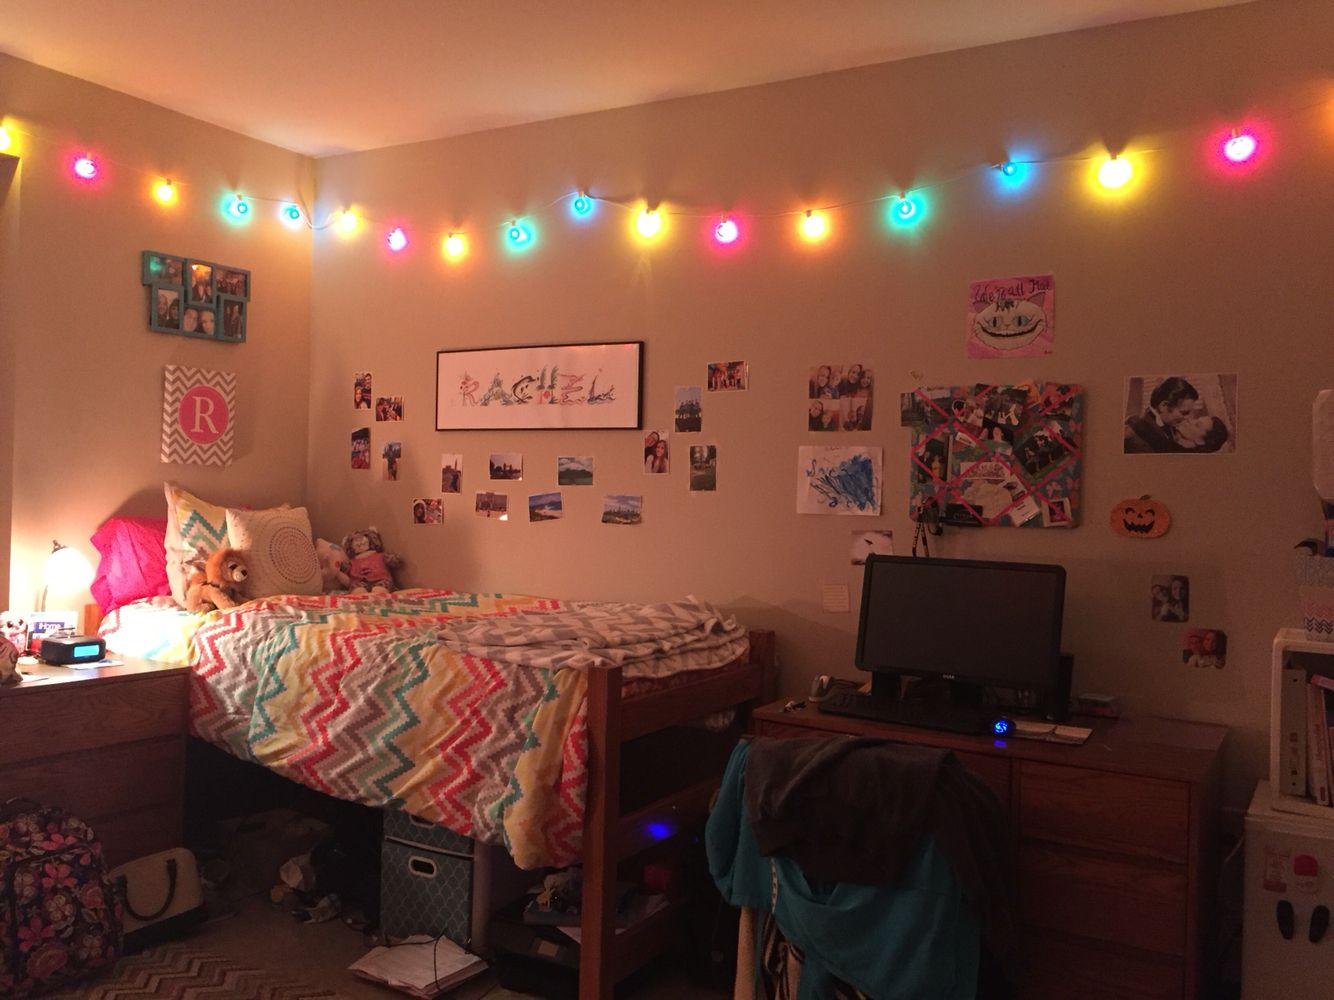 Dorm rooms lights - Room